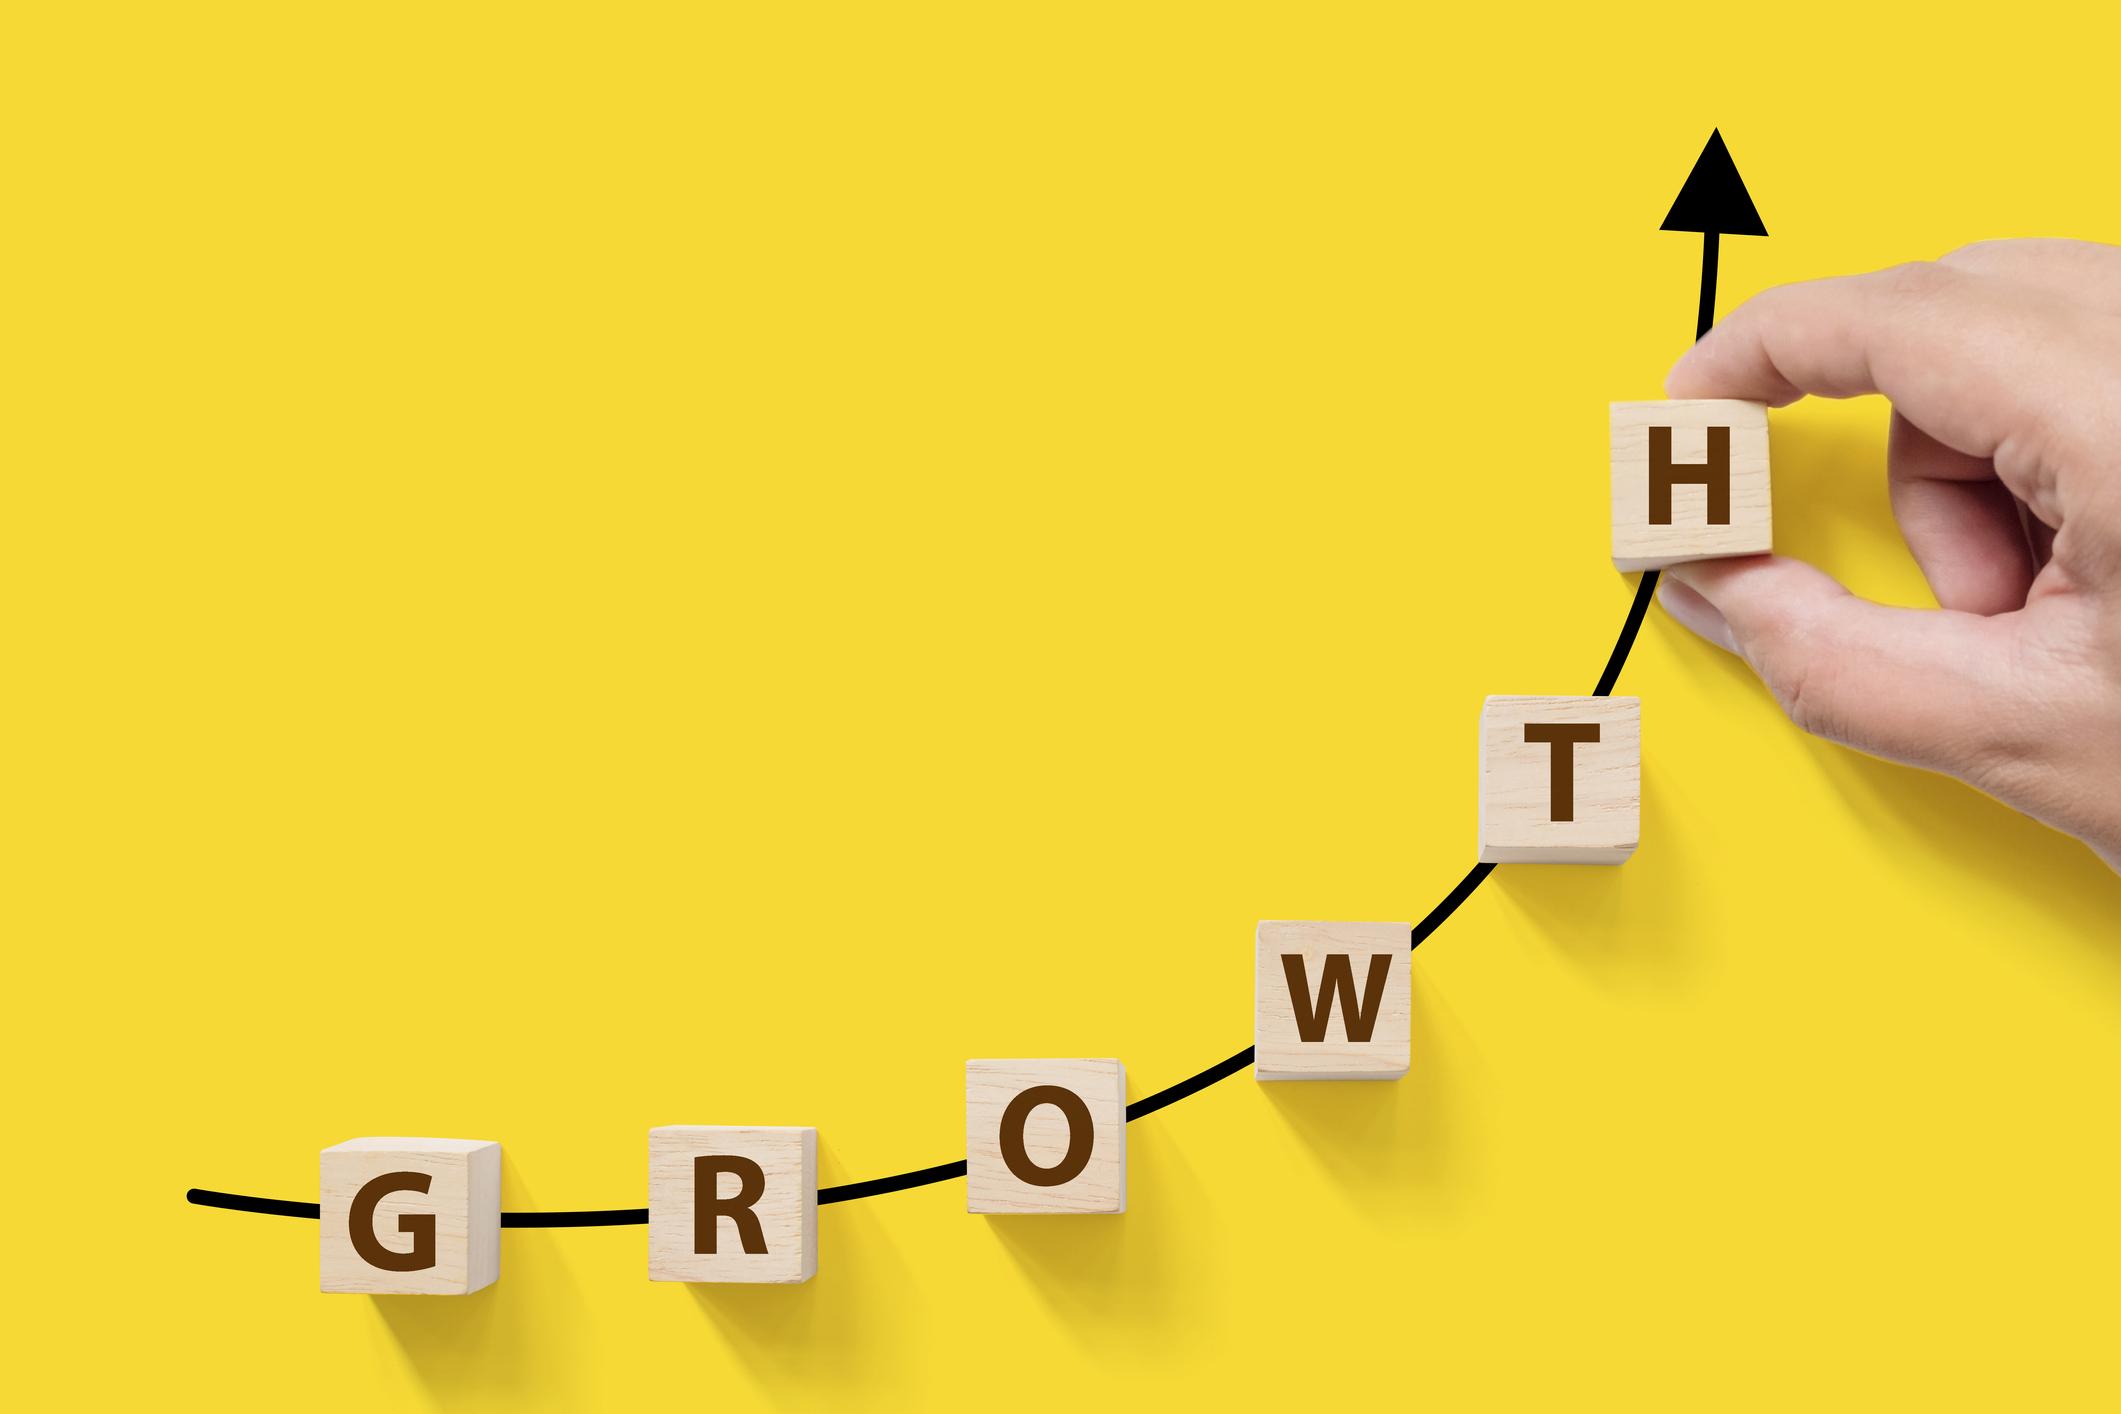 A hand placing growth tiles on an upward rising arrow.